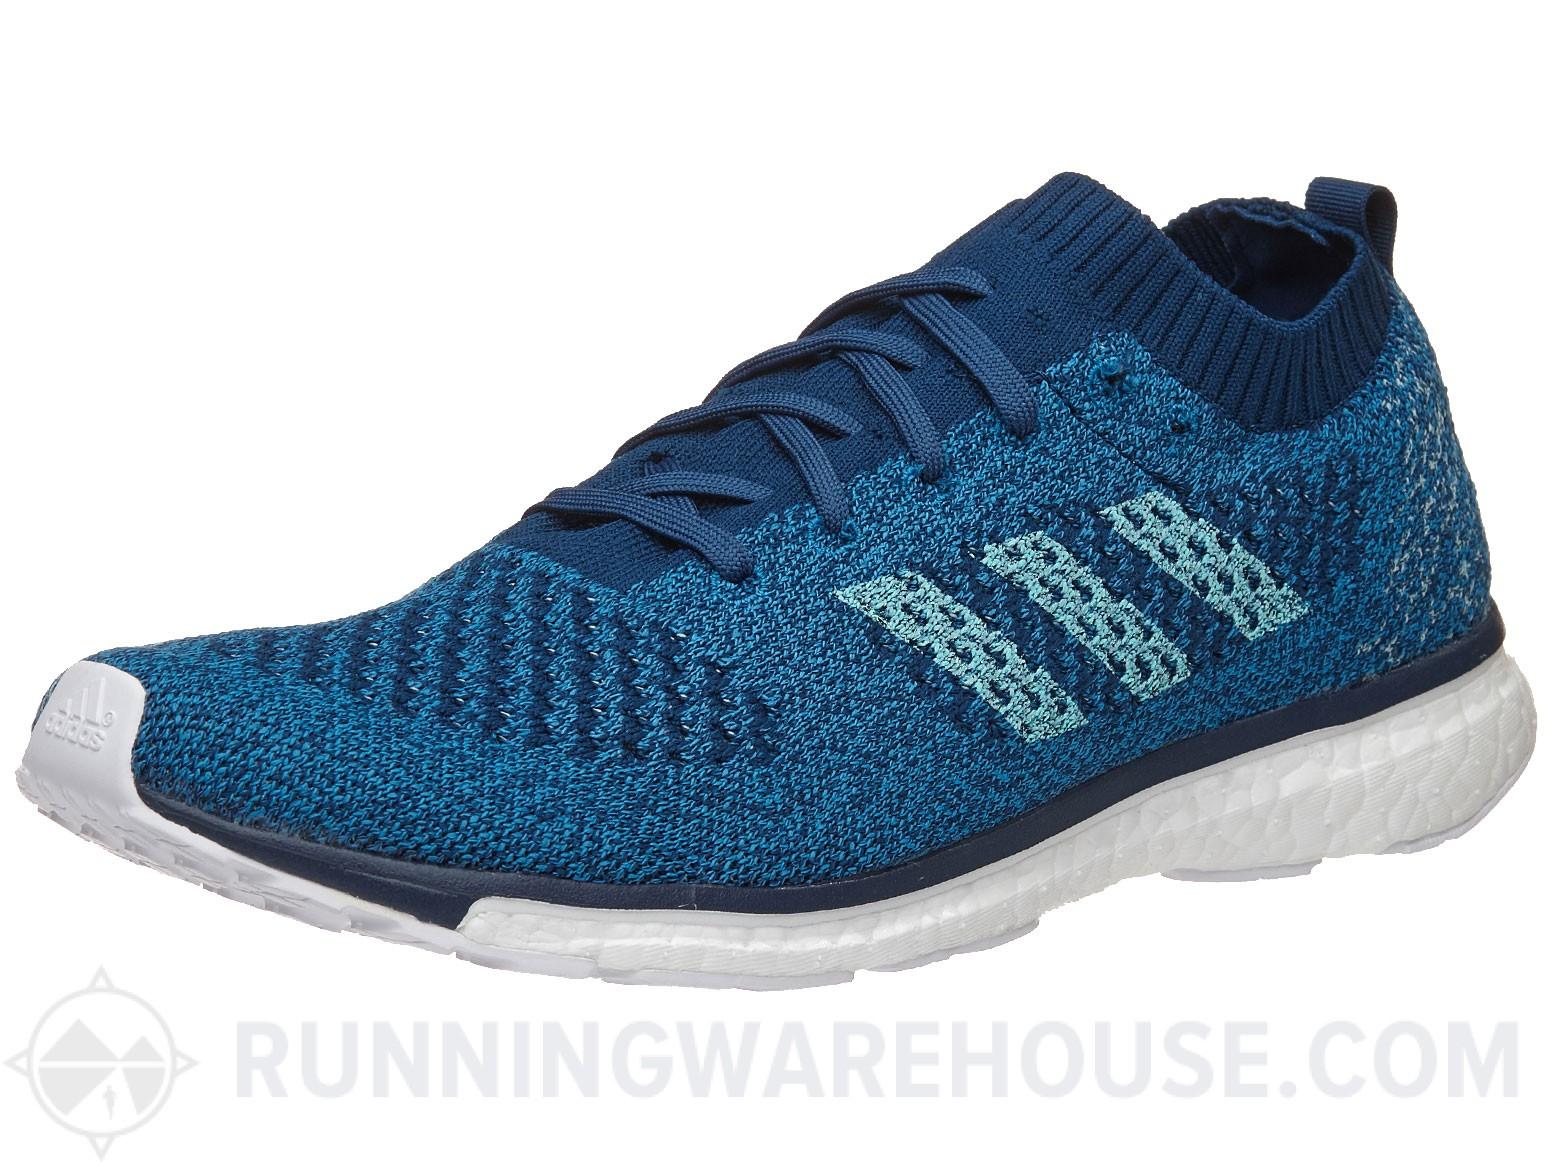 d8499fe736a818 Adidas Adizero Prime Parley Unisex Running Shoes  75+FS - Slickdeals.net